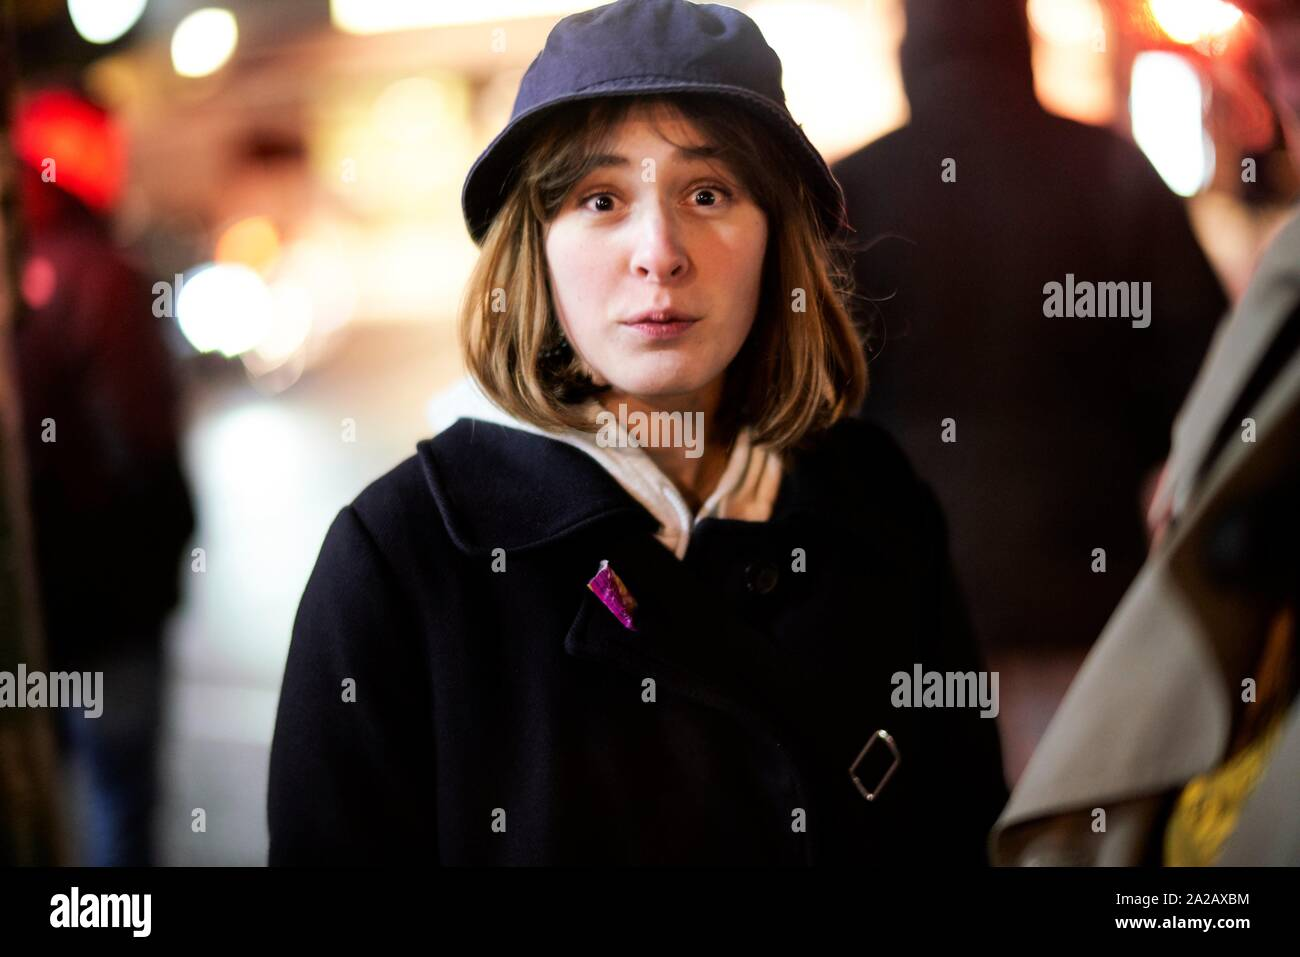 woman making big eyes at night on street Stock Photo